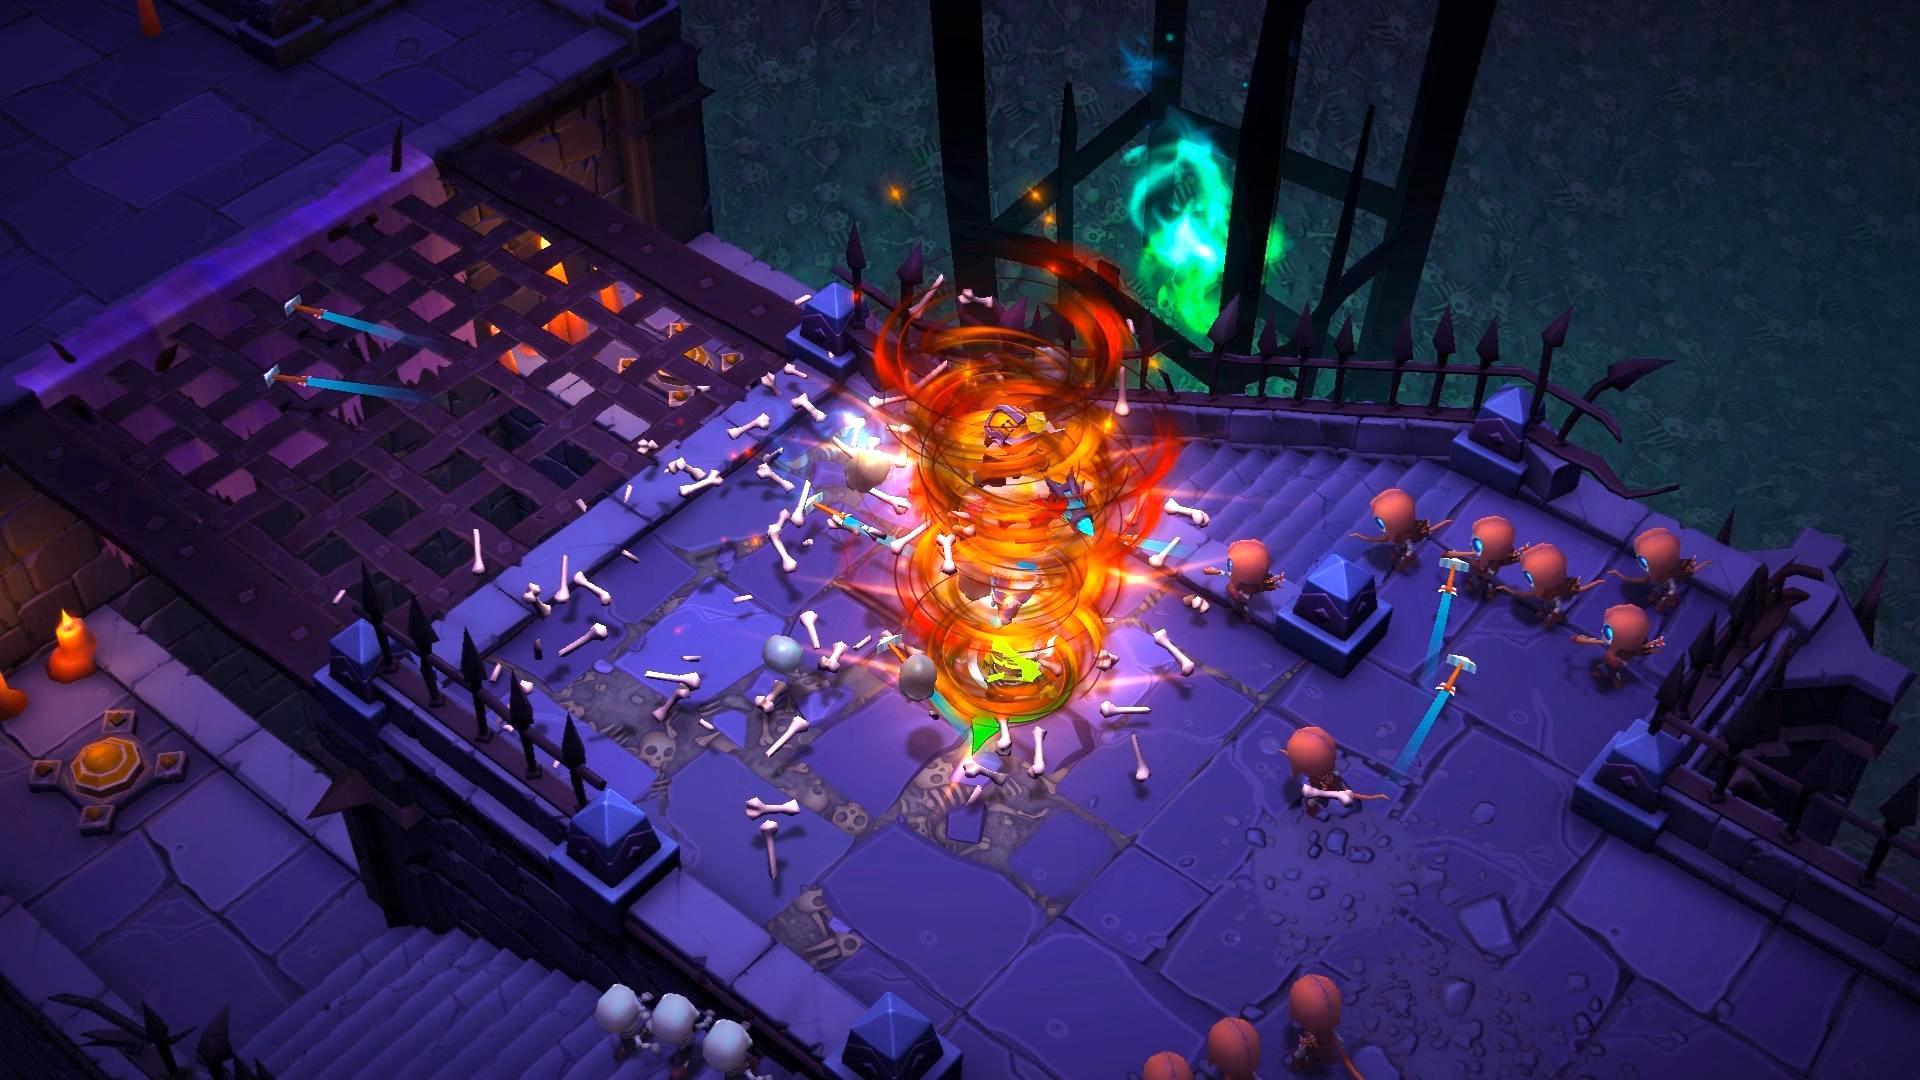 Amazon.com: Super Dungeon Bros. - Xbox One: Video Games